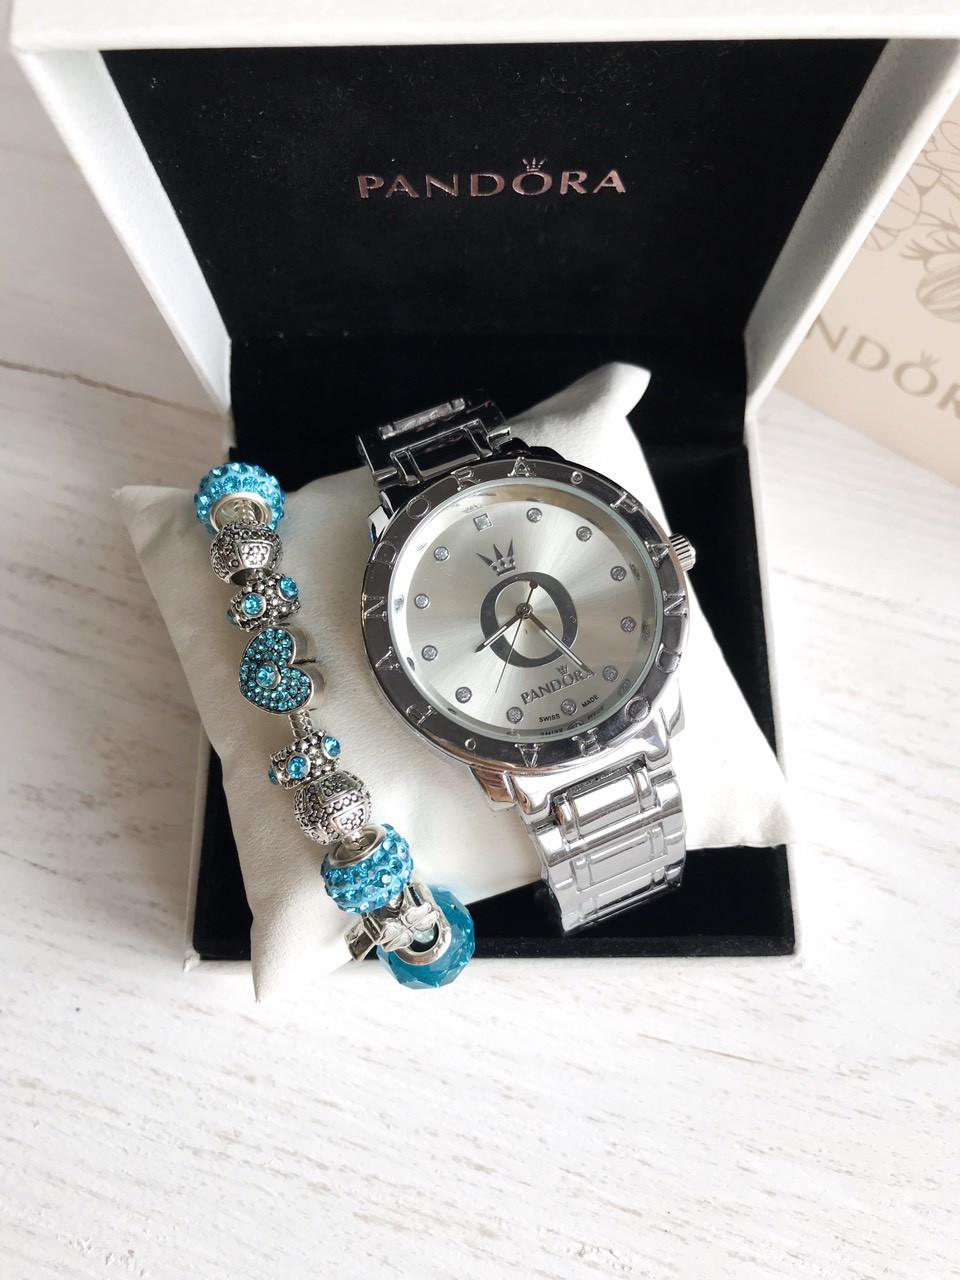 Женские часы Pandora опт дроп розница (серебро + белый циферблат), Реплика